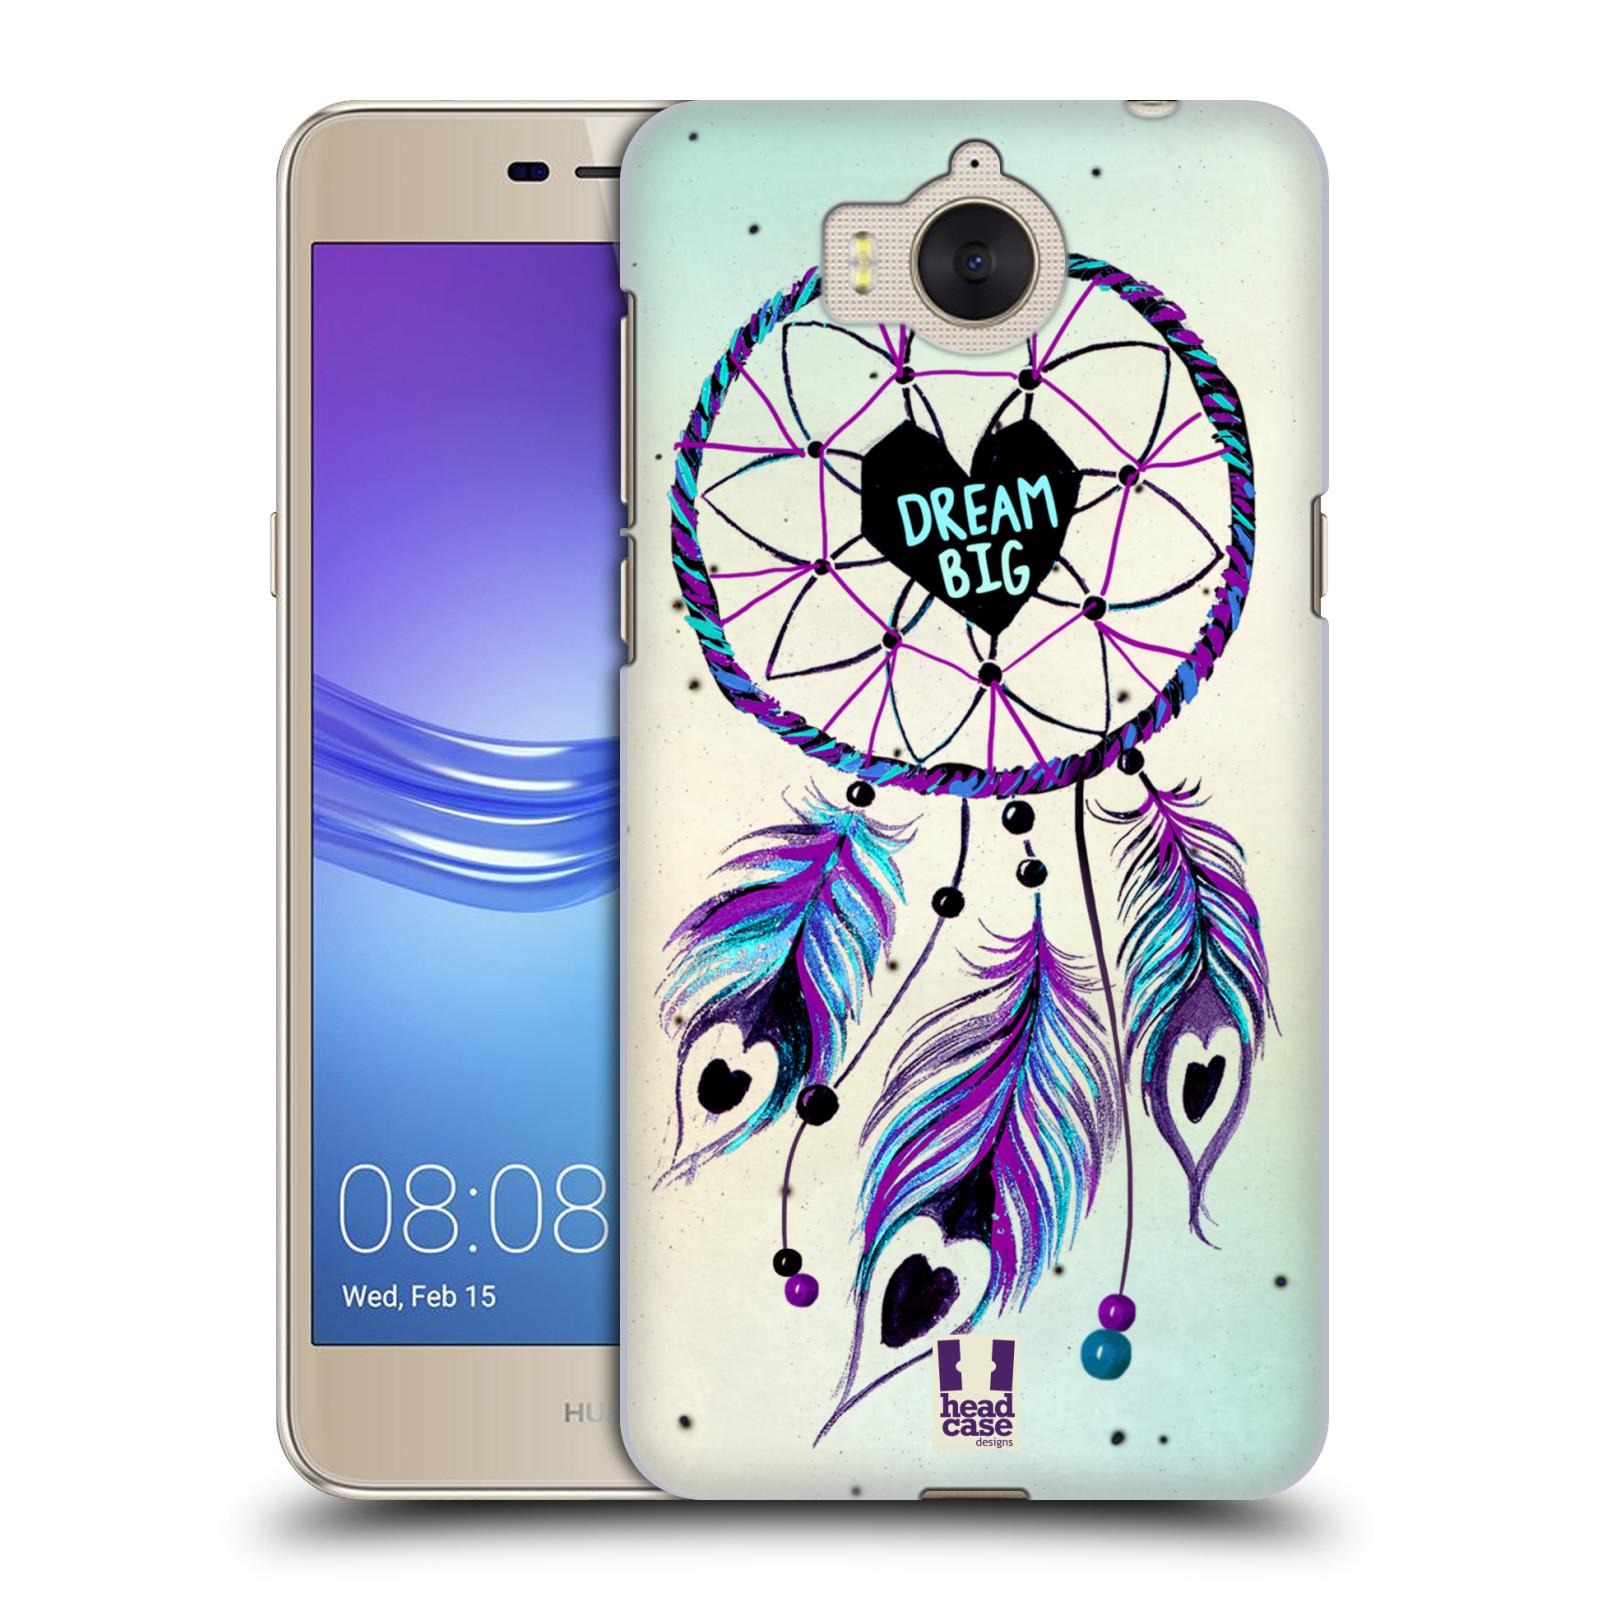 Plastové pouzdro na mobil Huawei Y6 2017 - Head Case - Lapač Assorted Dream Big Srdce